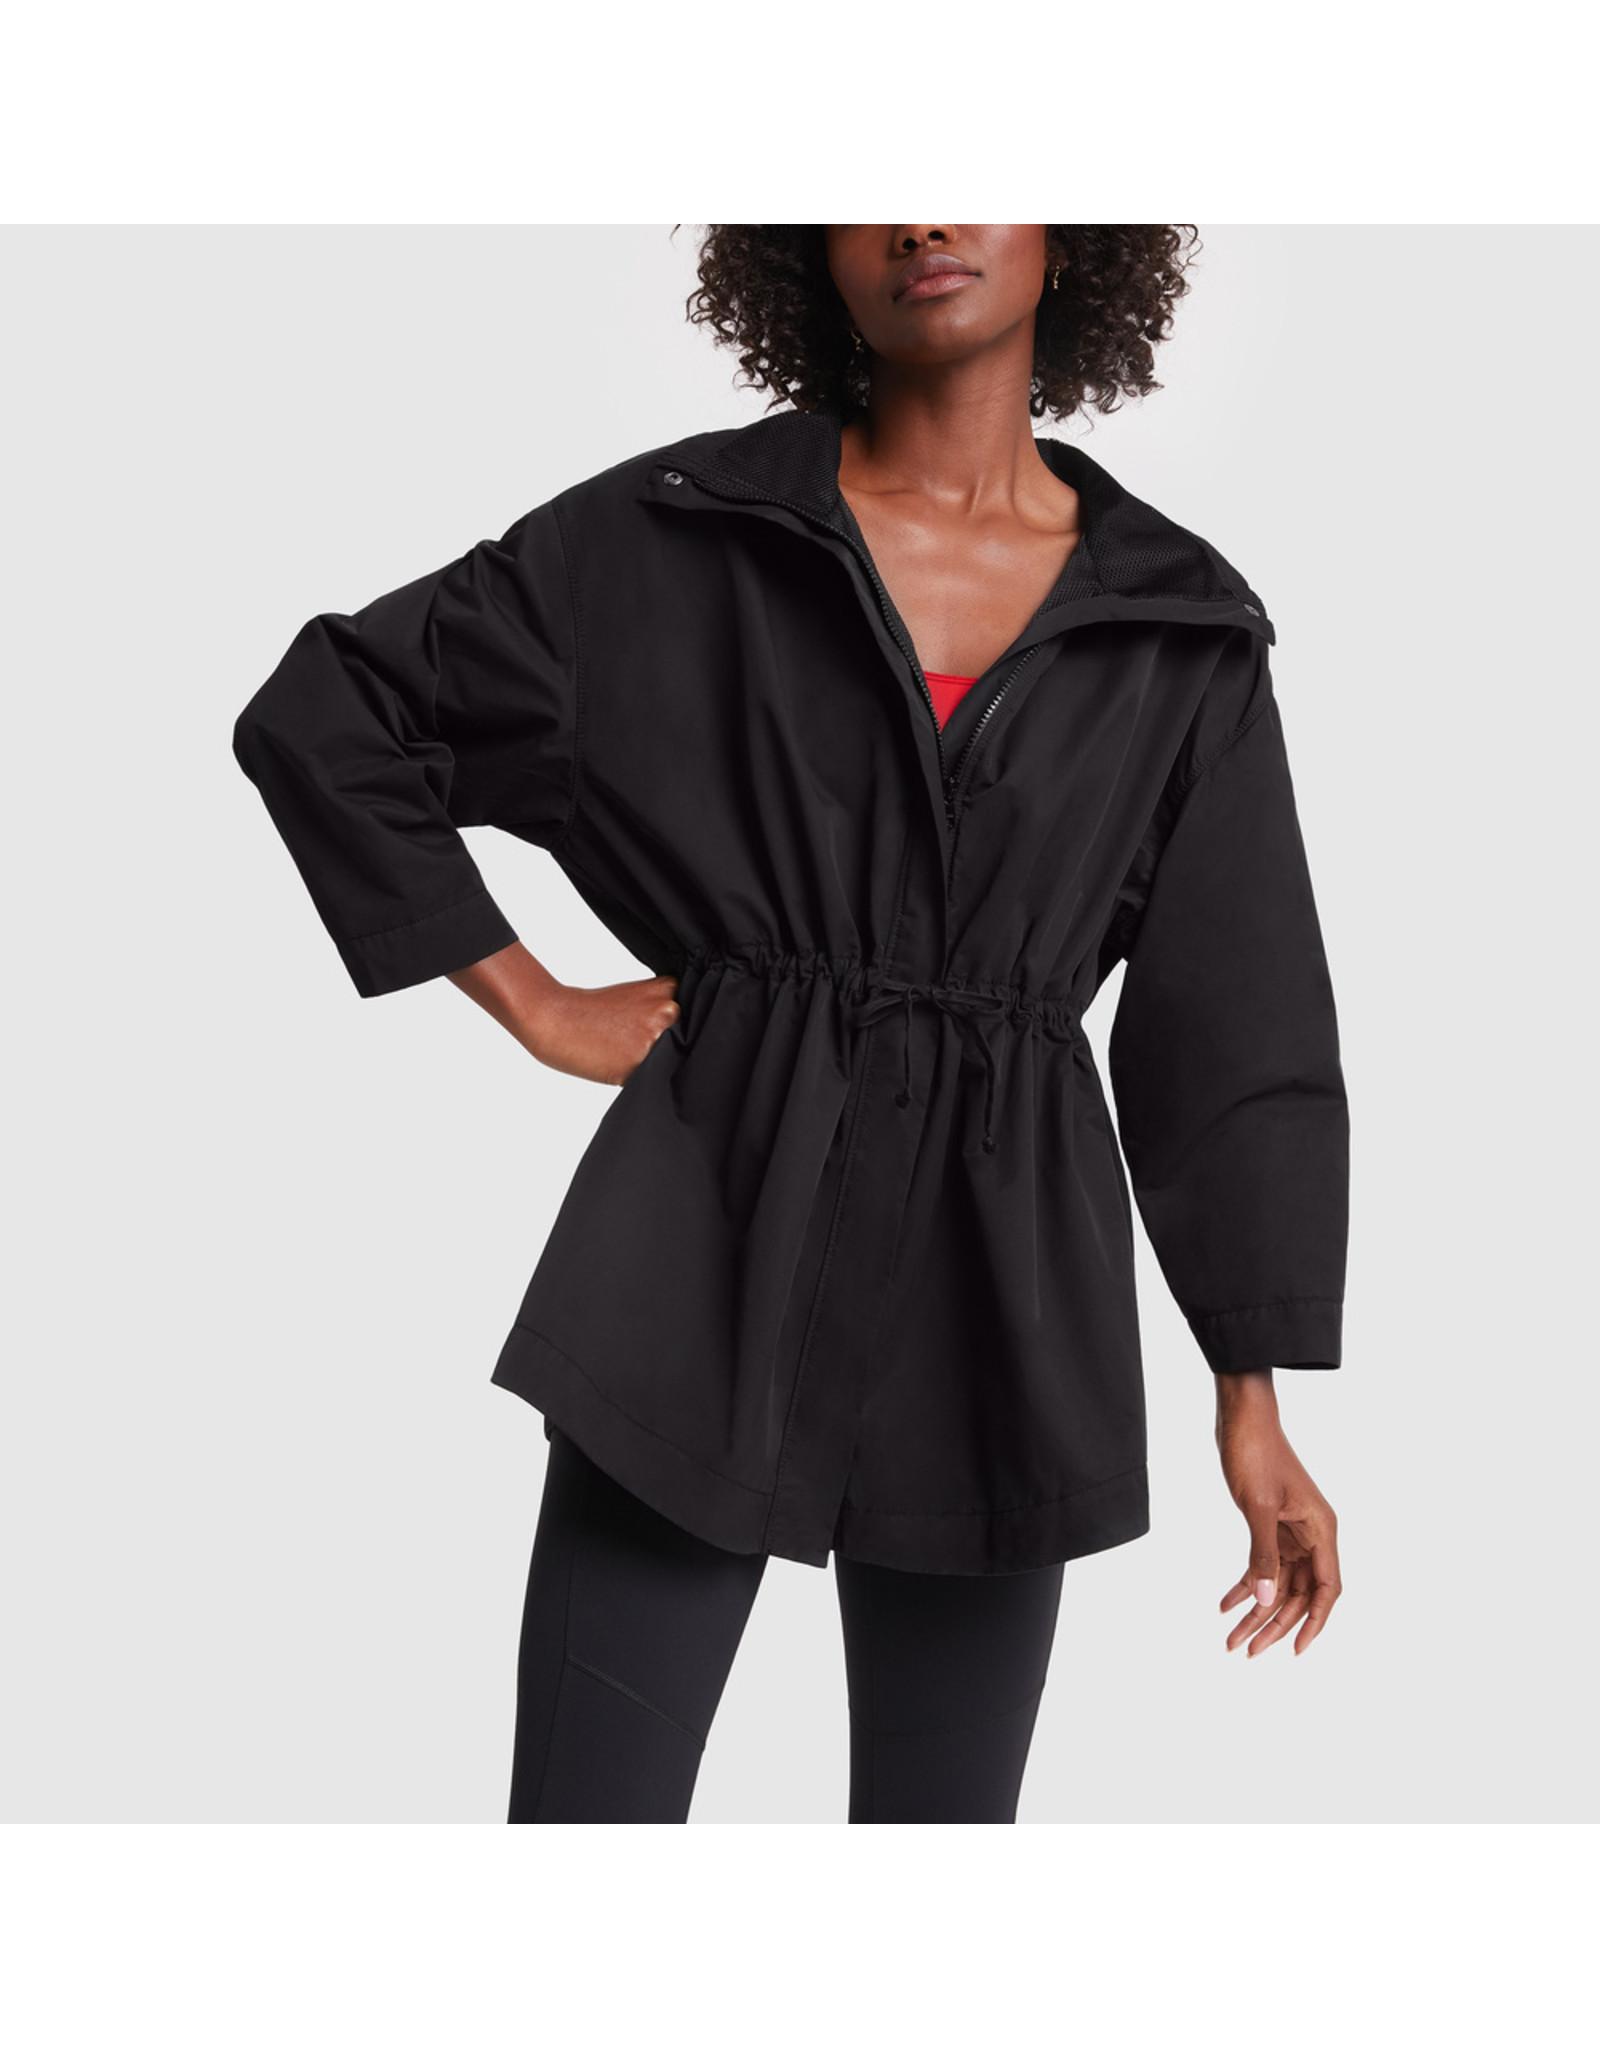 G. Sport x Proenza Schouler G. Sport x Proenza Schouler Jacket (Color: Black, Size: M)